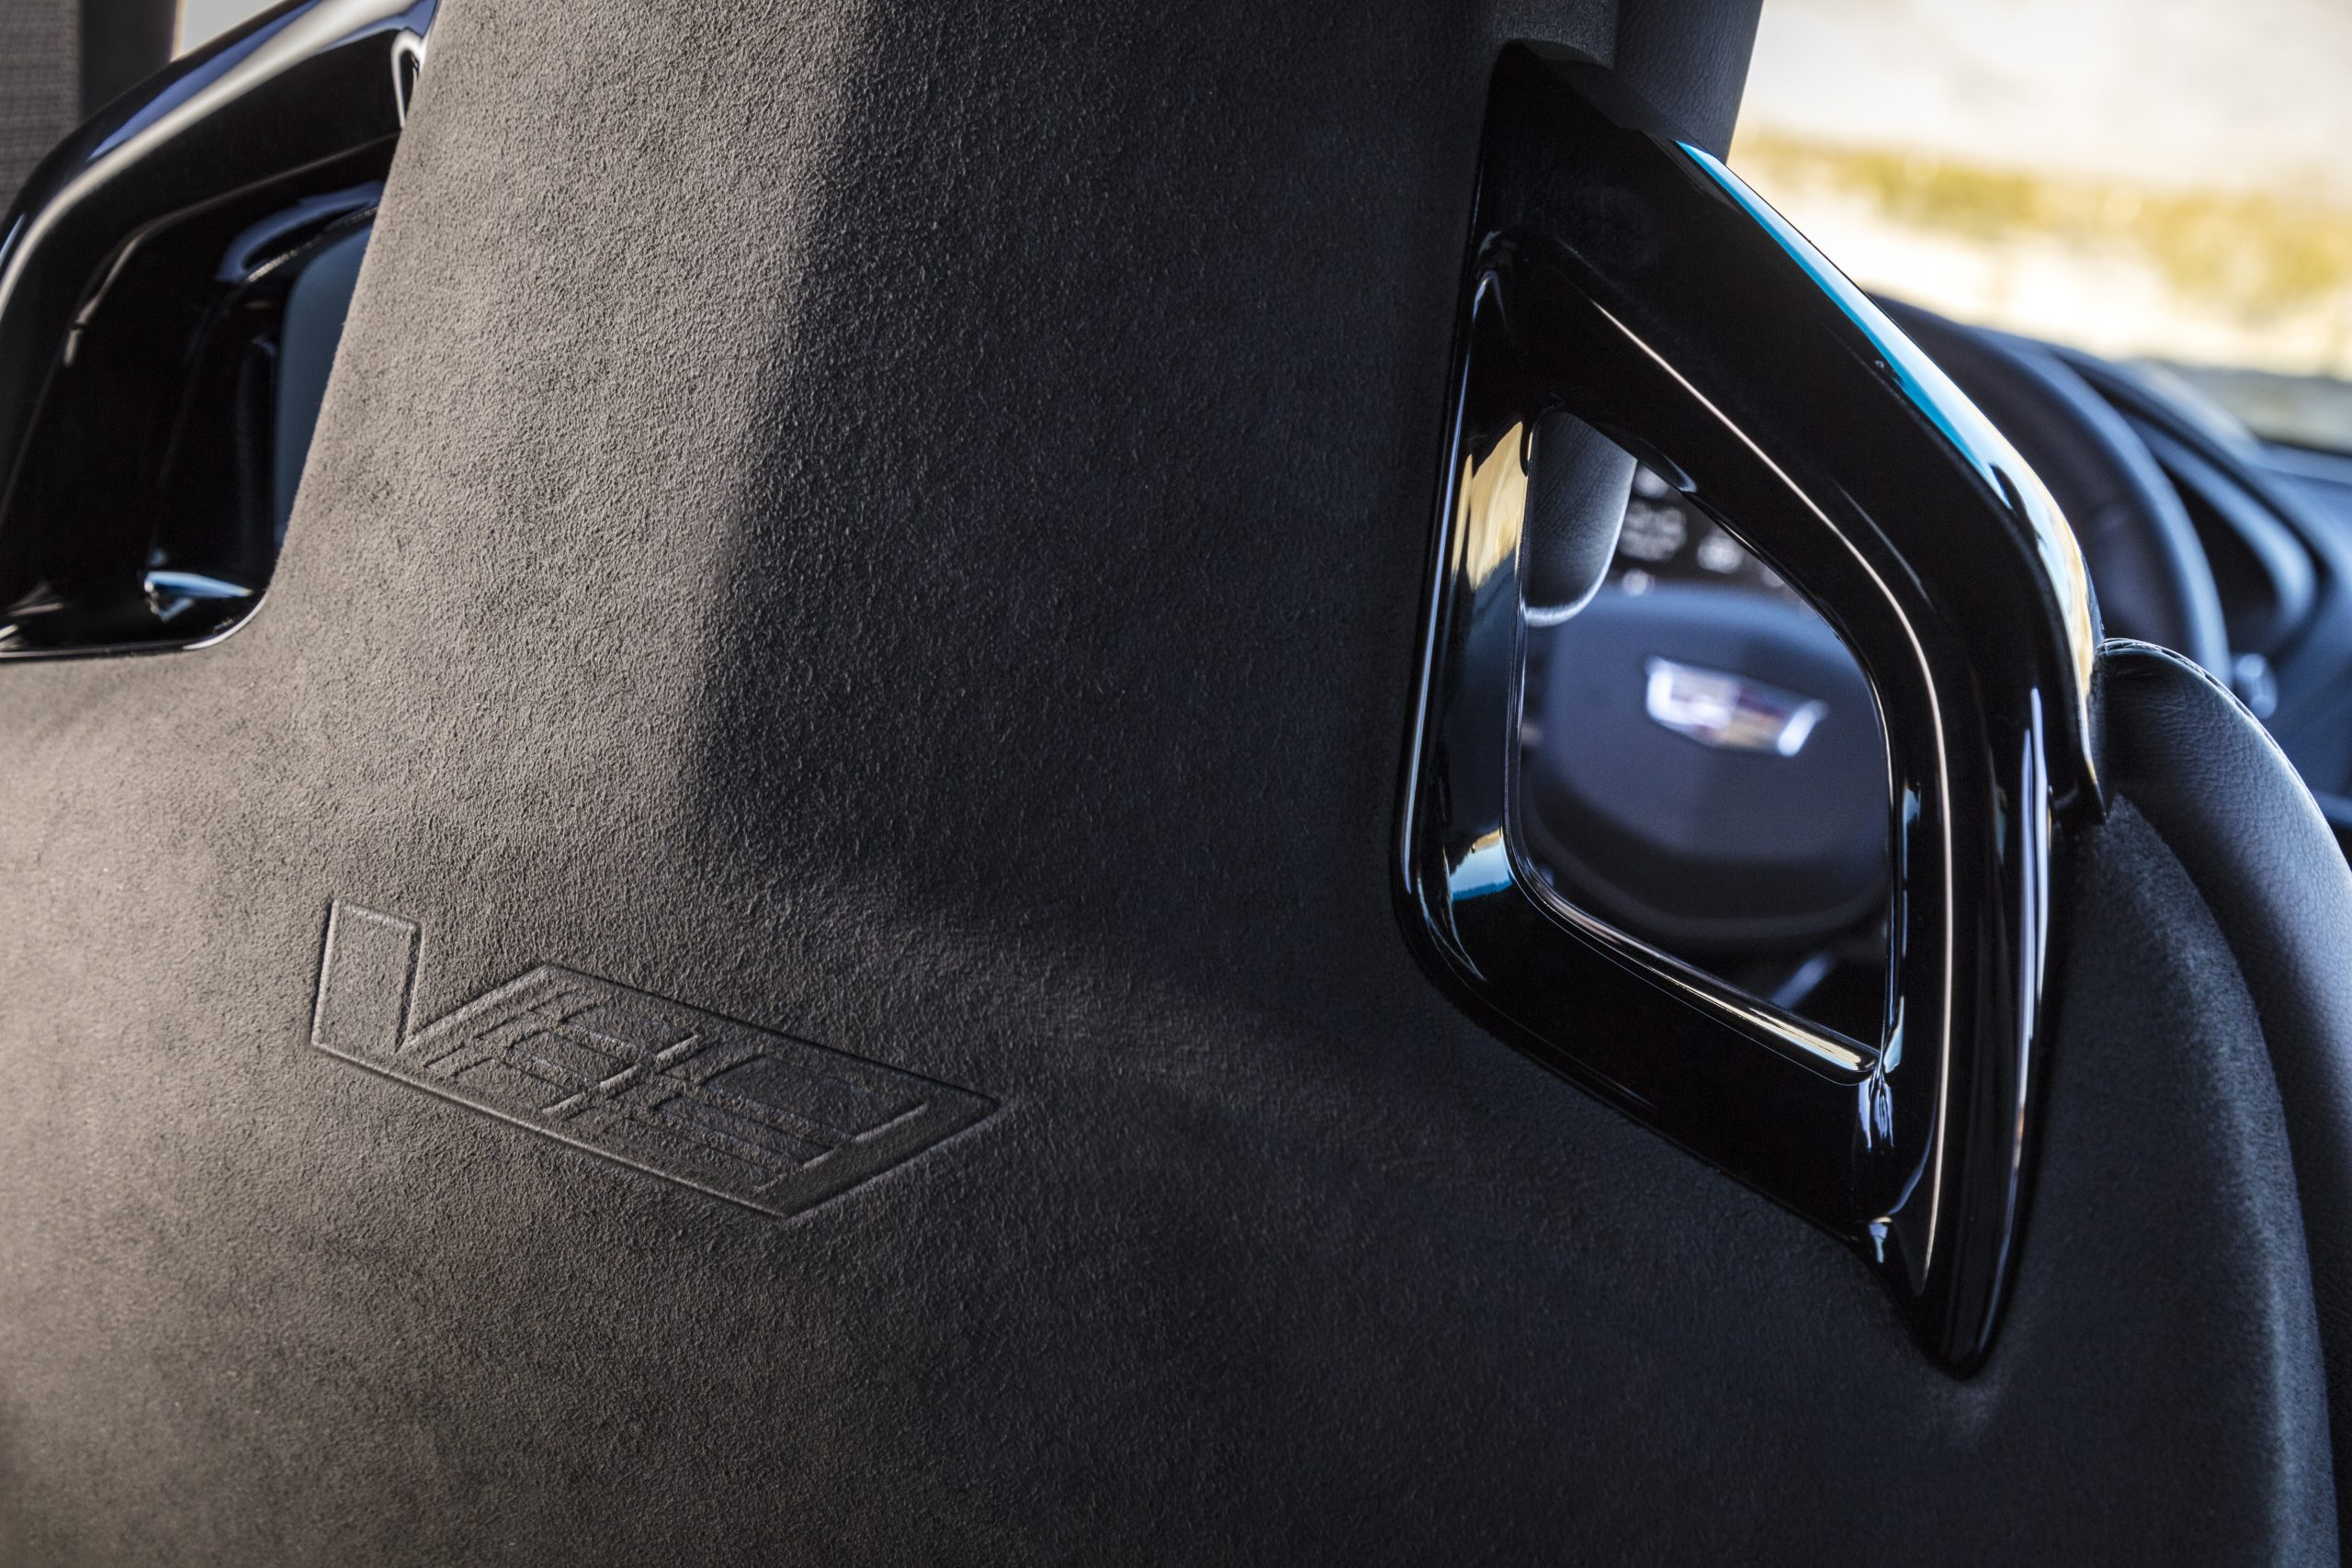 2022 Cadillac CT4-V Blackwing seat back logo